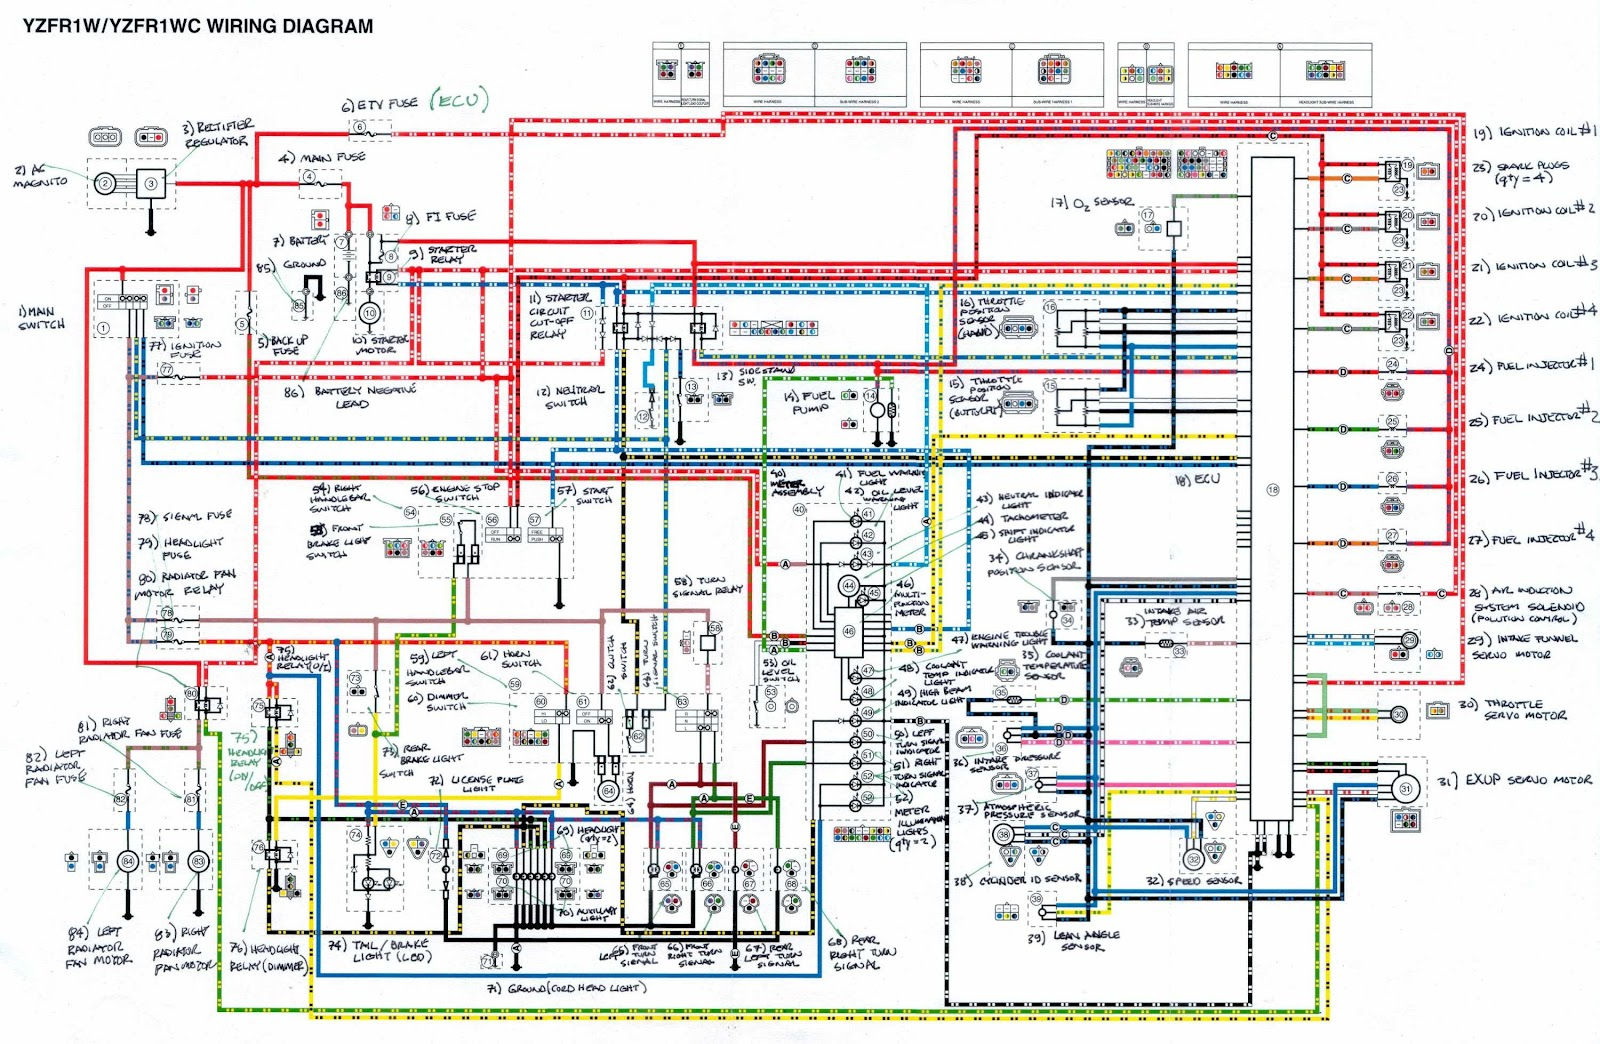 Yamaha+YZF R1+Motorcycle+Wiring+Diagram?w\\\=150u0026h\\\=150 harness yamaha wiring vz225tr yamaha outboard control wiring  at alyssarenee.co